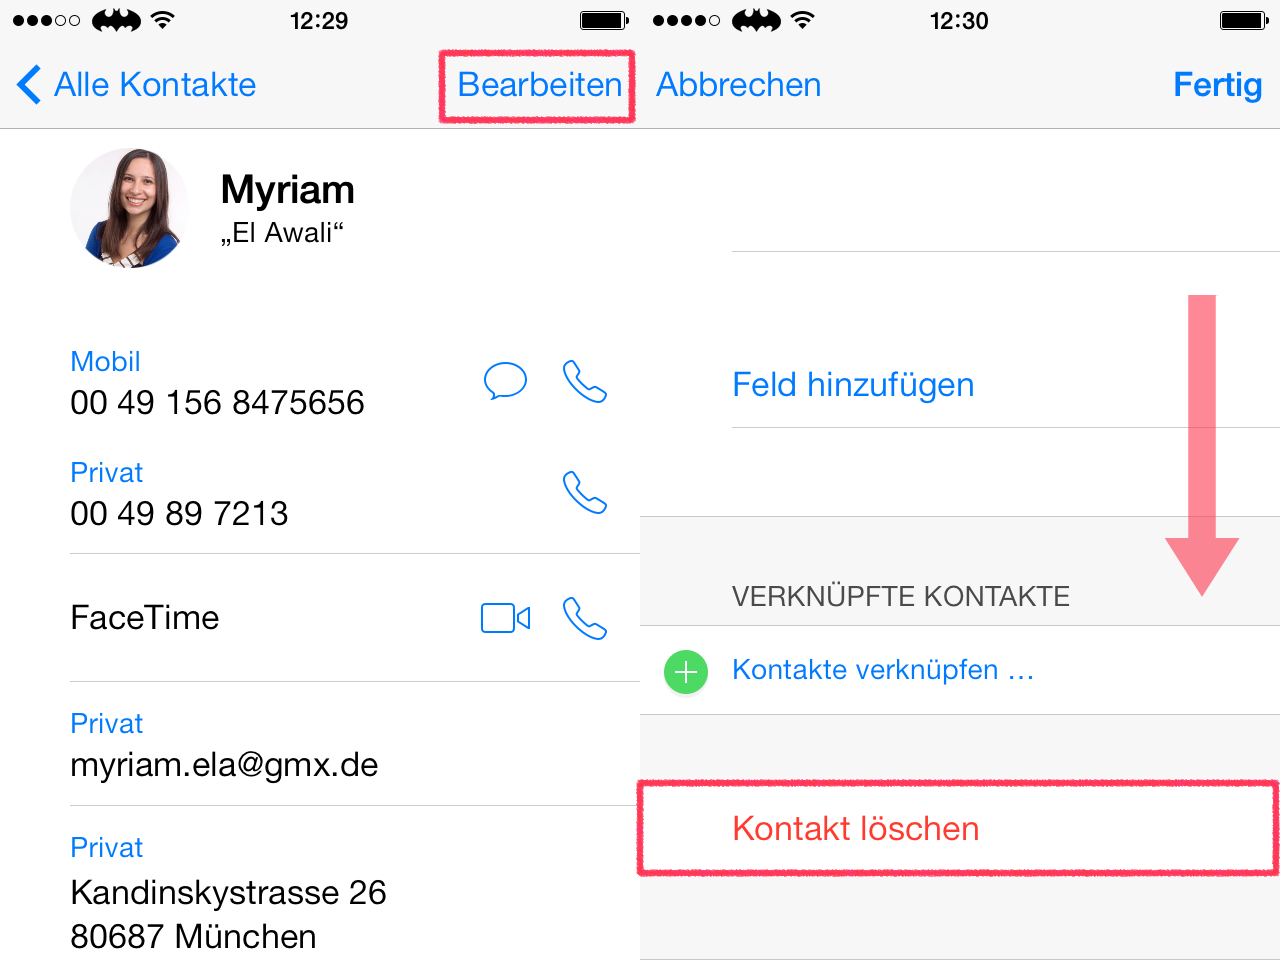 Iphone gesperrte kontakte löschen